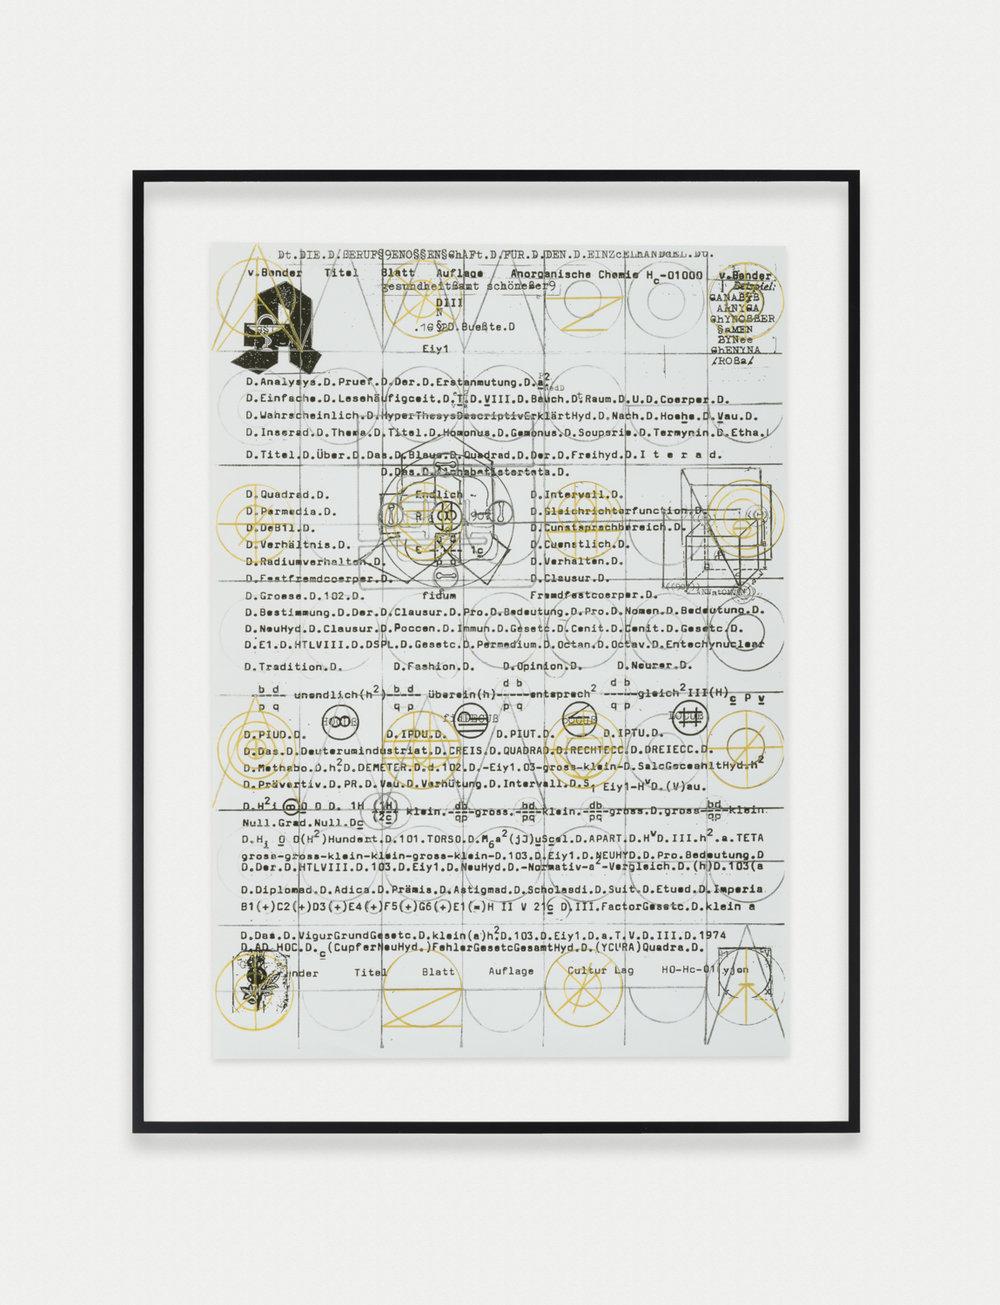 Adelhyd van Bender Untitled 1999-2014 Mixed media on photocopy 16.5 x 11.75 in (41.91h x 29.85w cm) AVB016